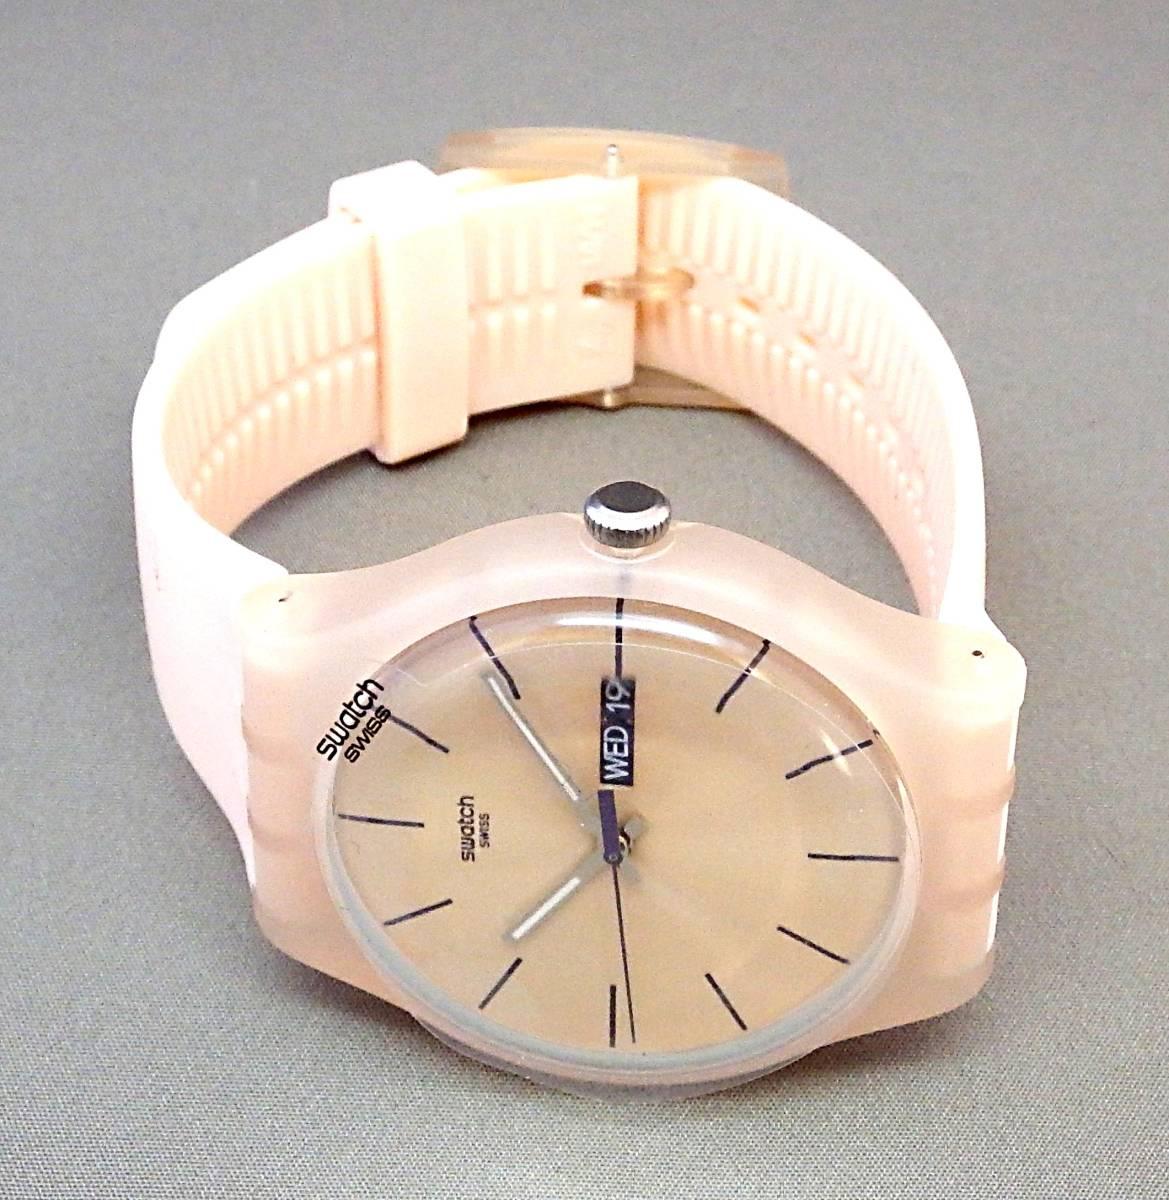 EU-9112■swatch スウォッチ SUOT700 メンズ腕時計 3針カレンダ- ケース付き 中古■切手可_画像2